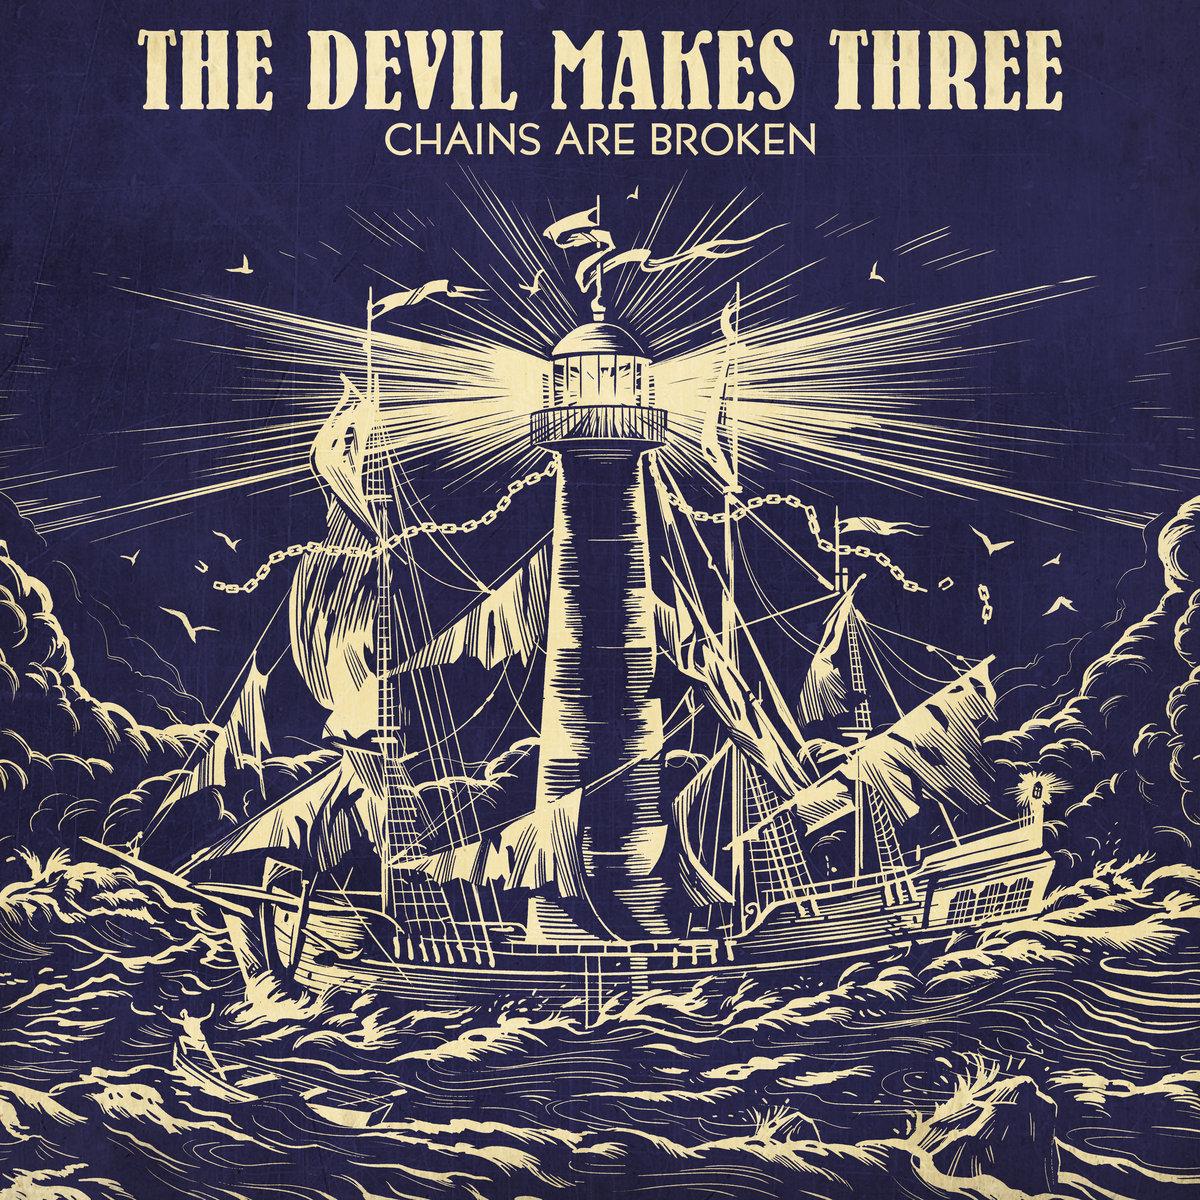 NEW RELEASES, 8/24: INTERPOL, THE DEVIL MAKES THREE, NEIL & LIAM